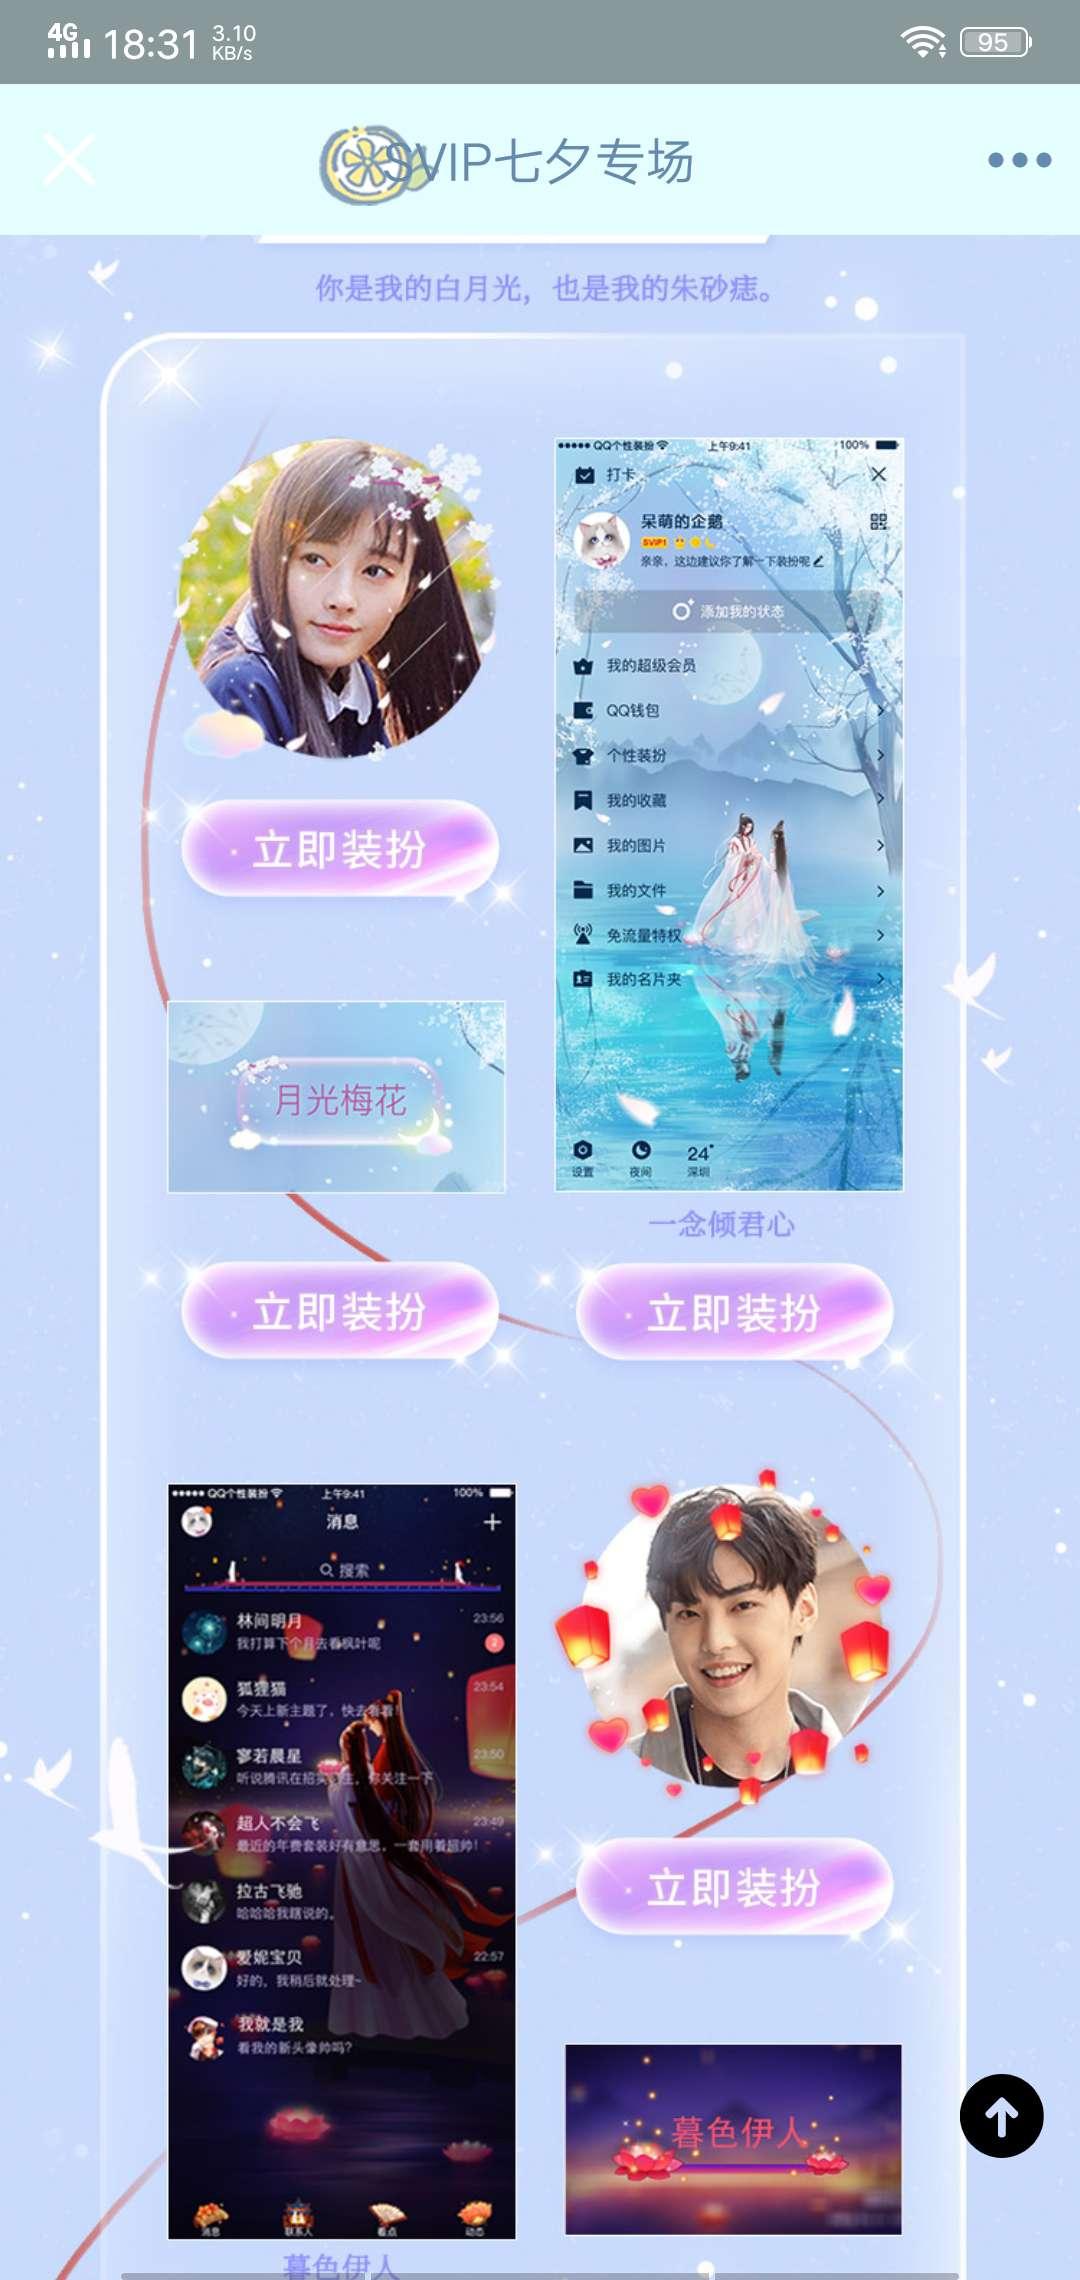 QQ超会免费领七夕装扮插图4